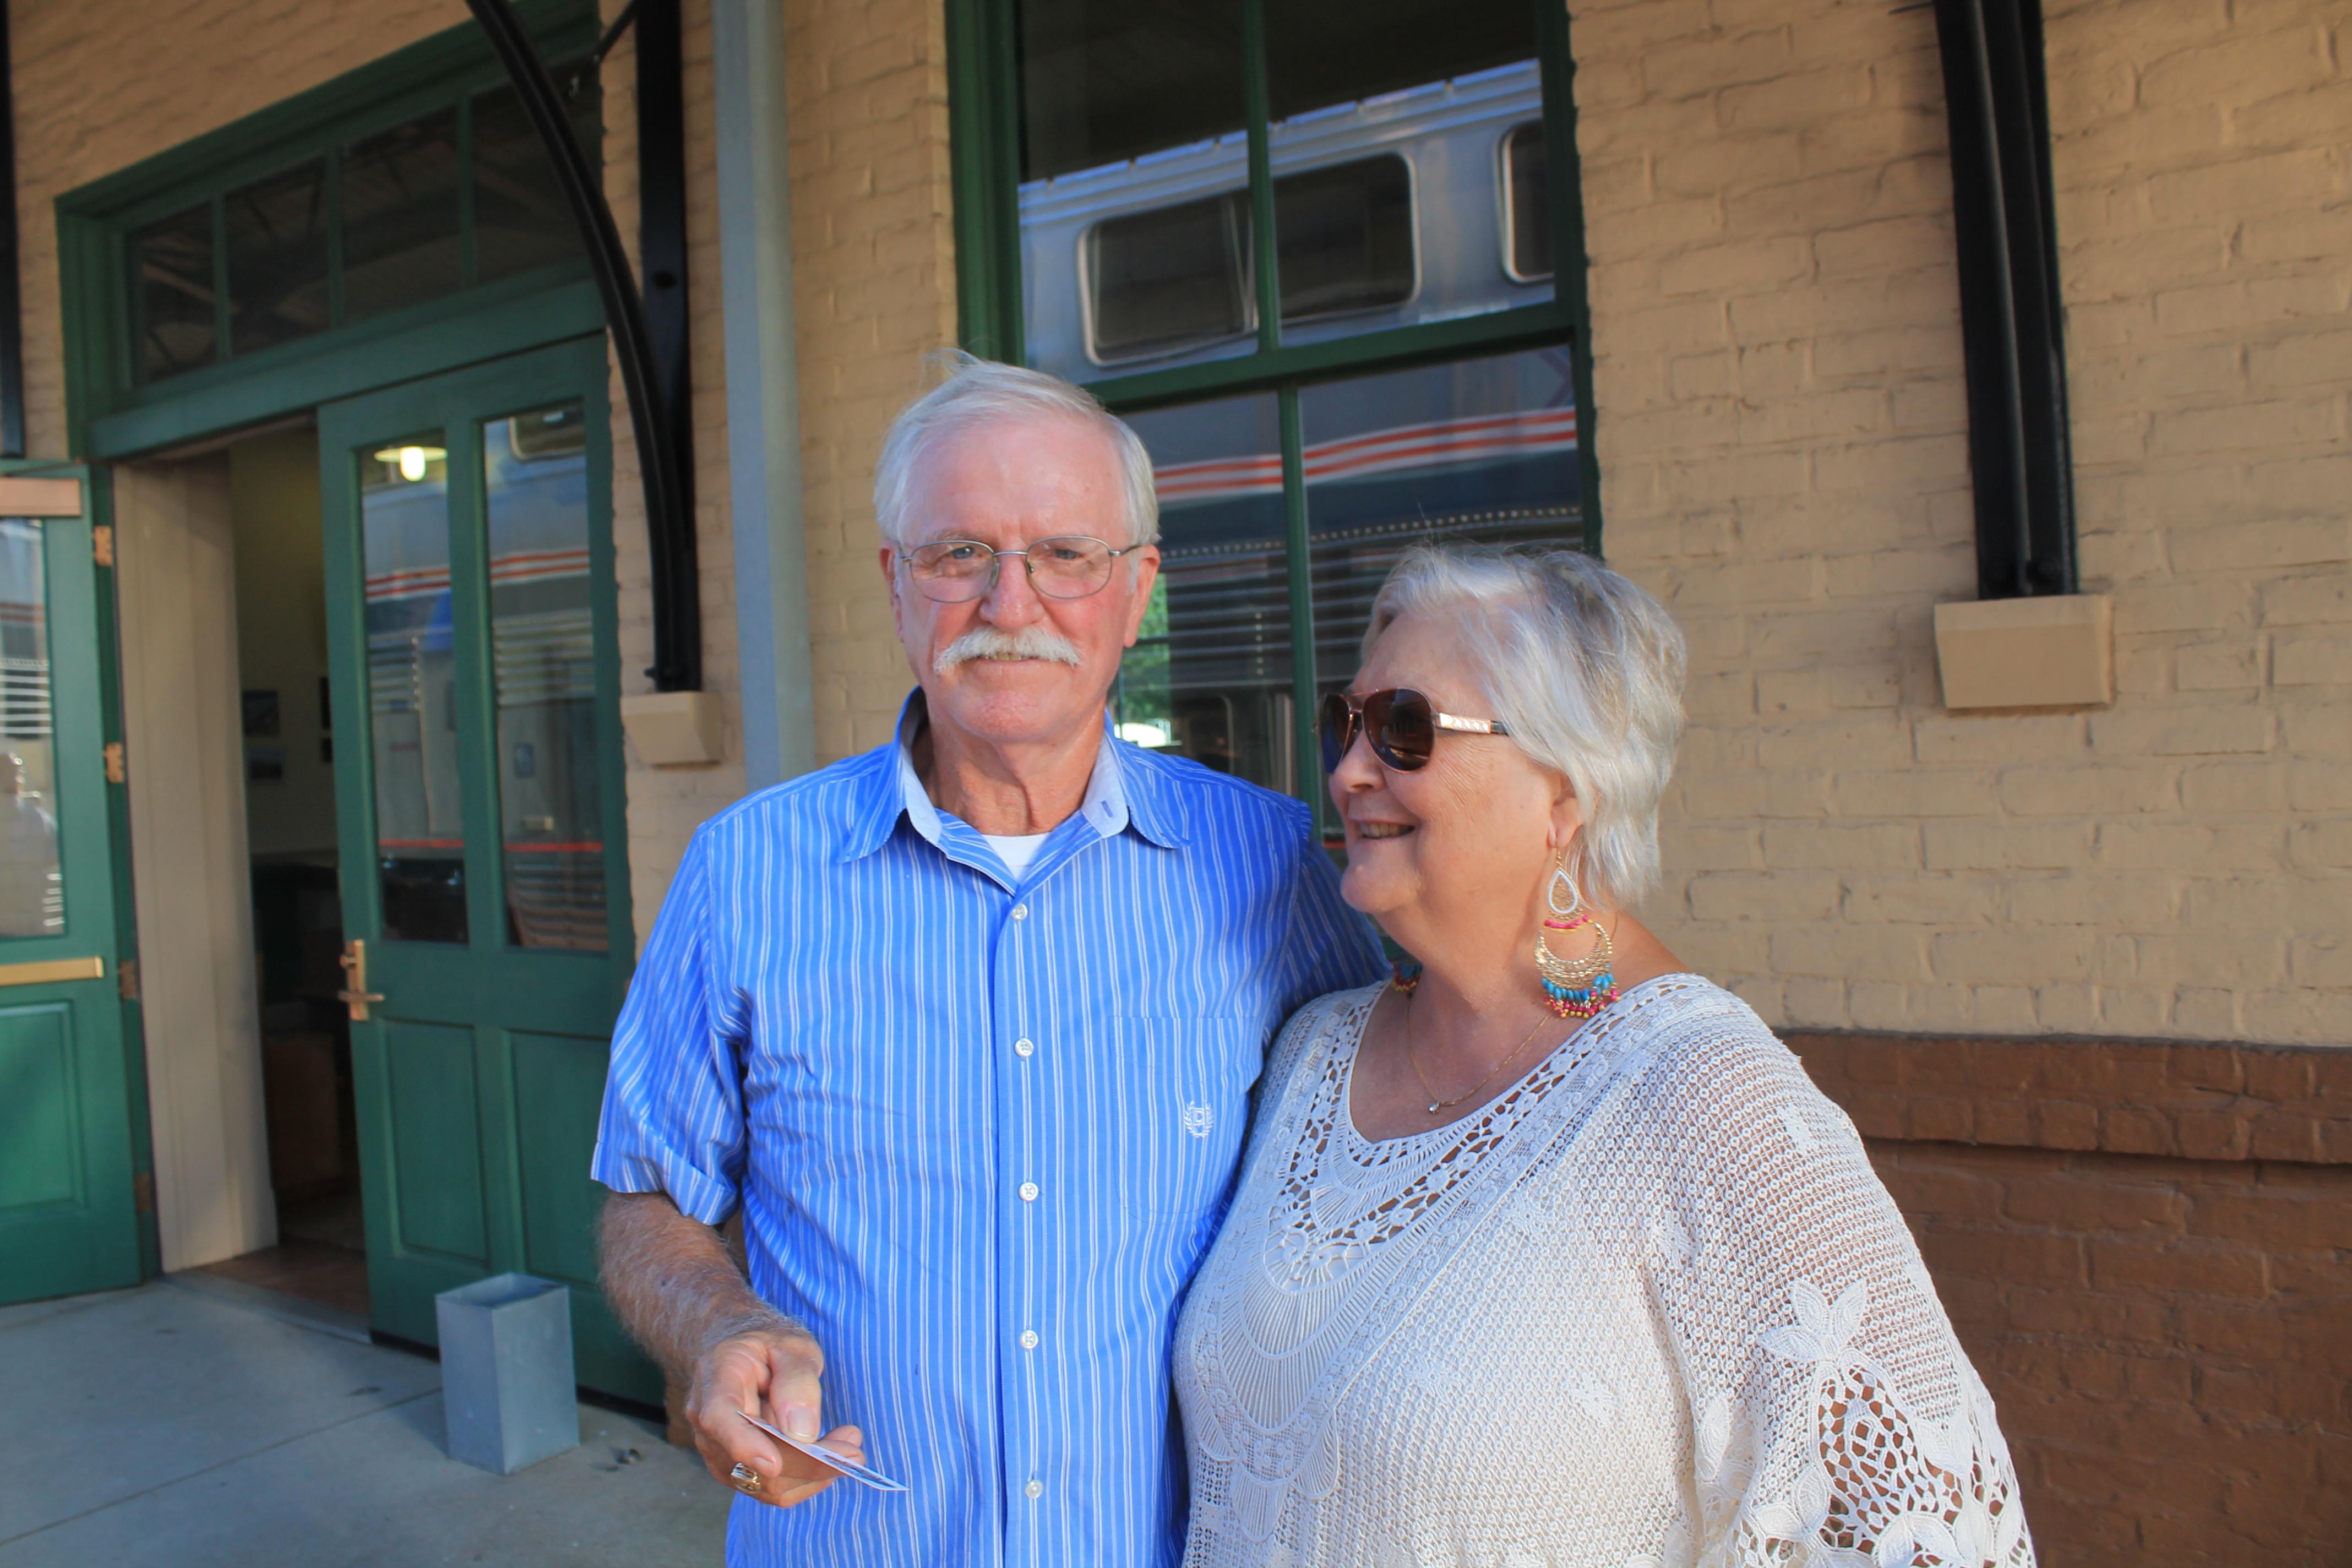 Doug and Carolyn Franklin at the Amtrak Depot in Mineola,TX.